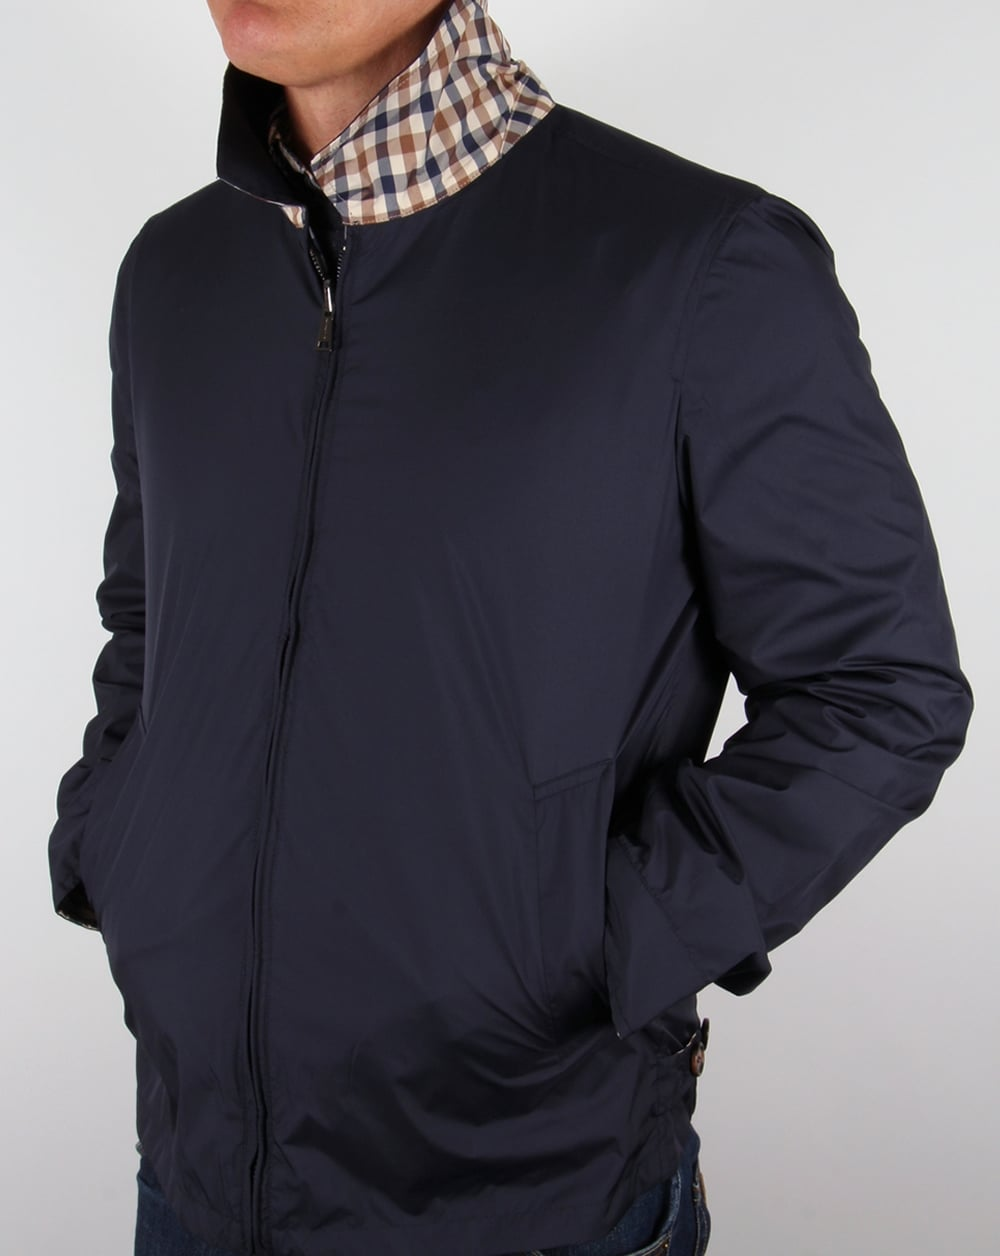 Aquascutum Brackenberry Reversible Blouson Jacket Navy